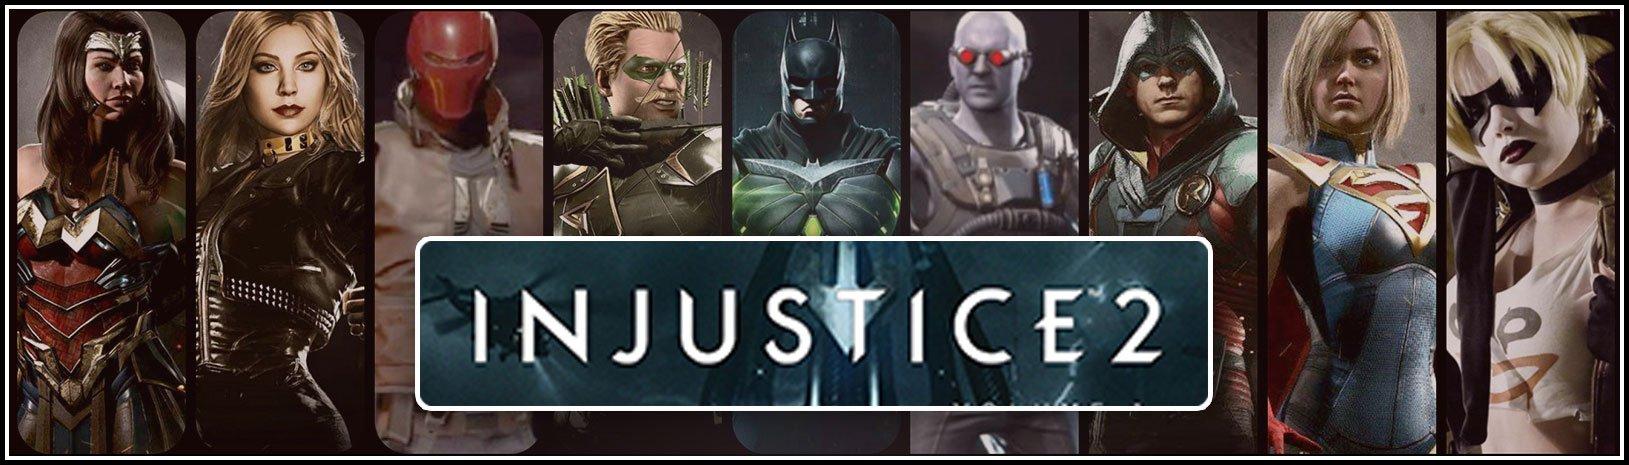 injustice Jackets